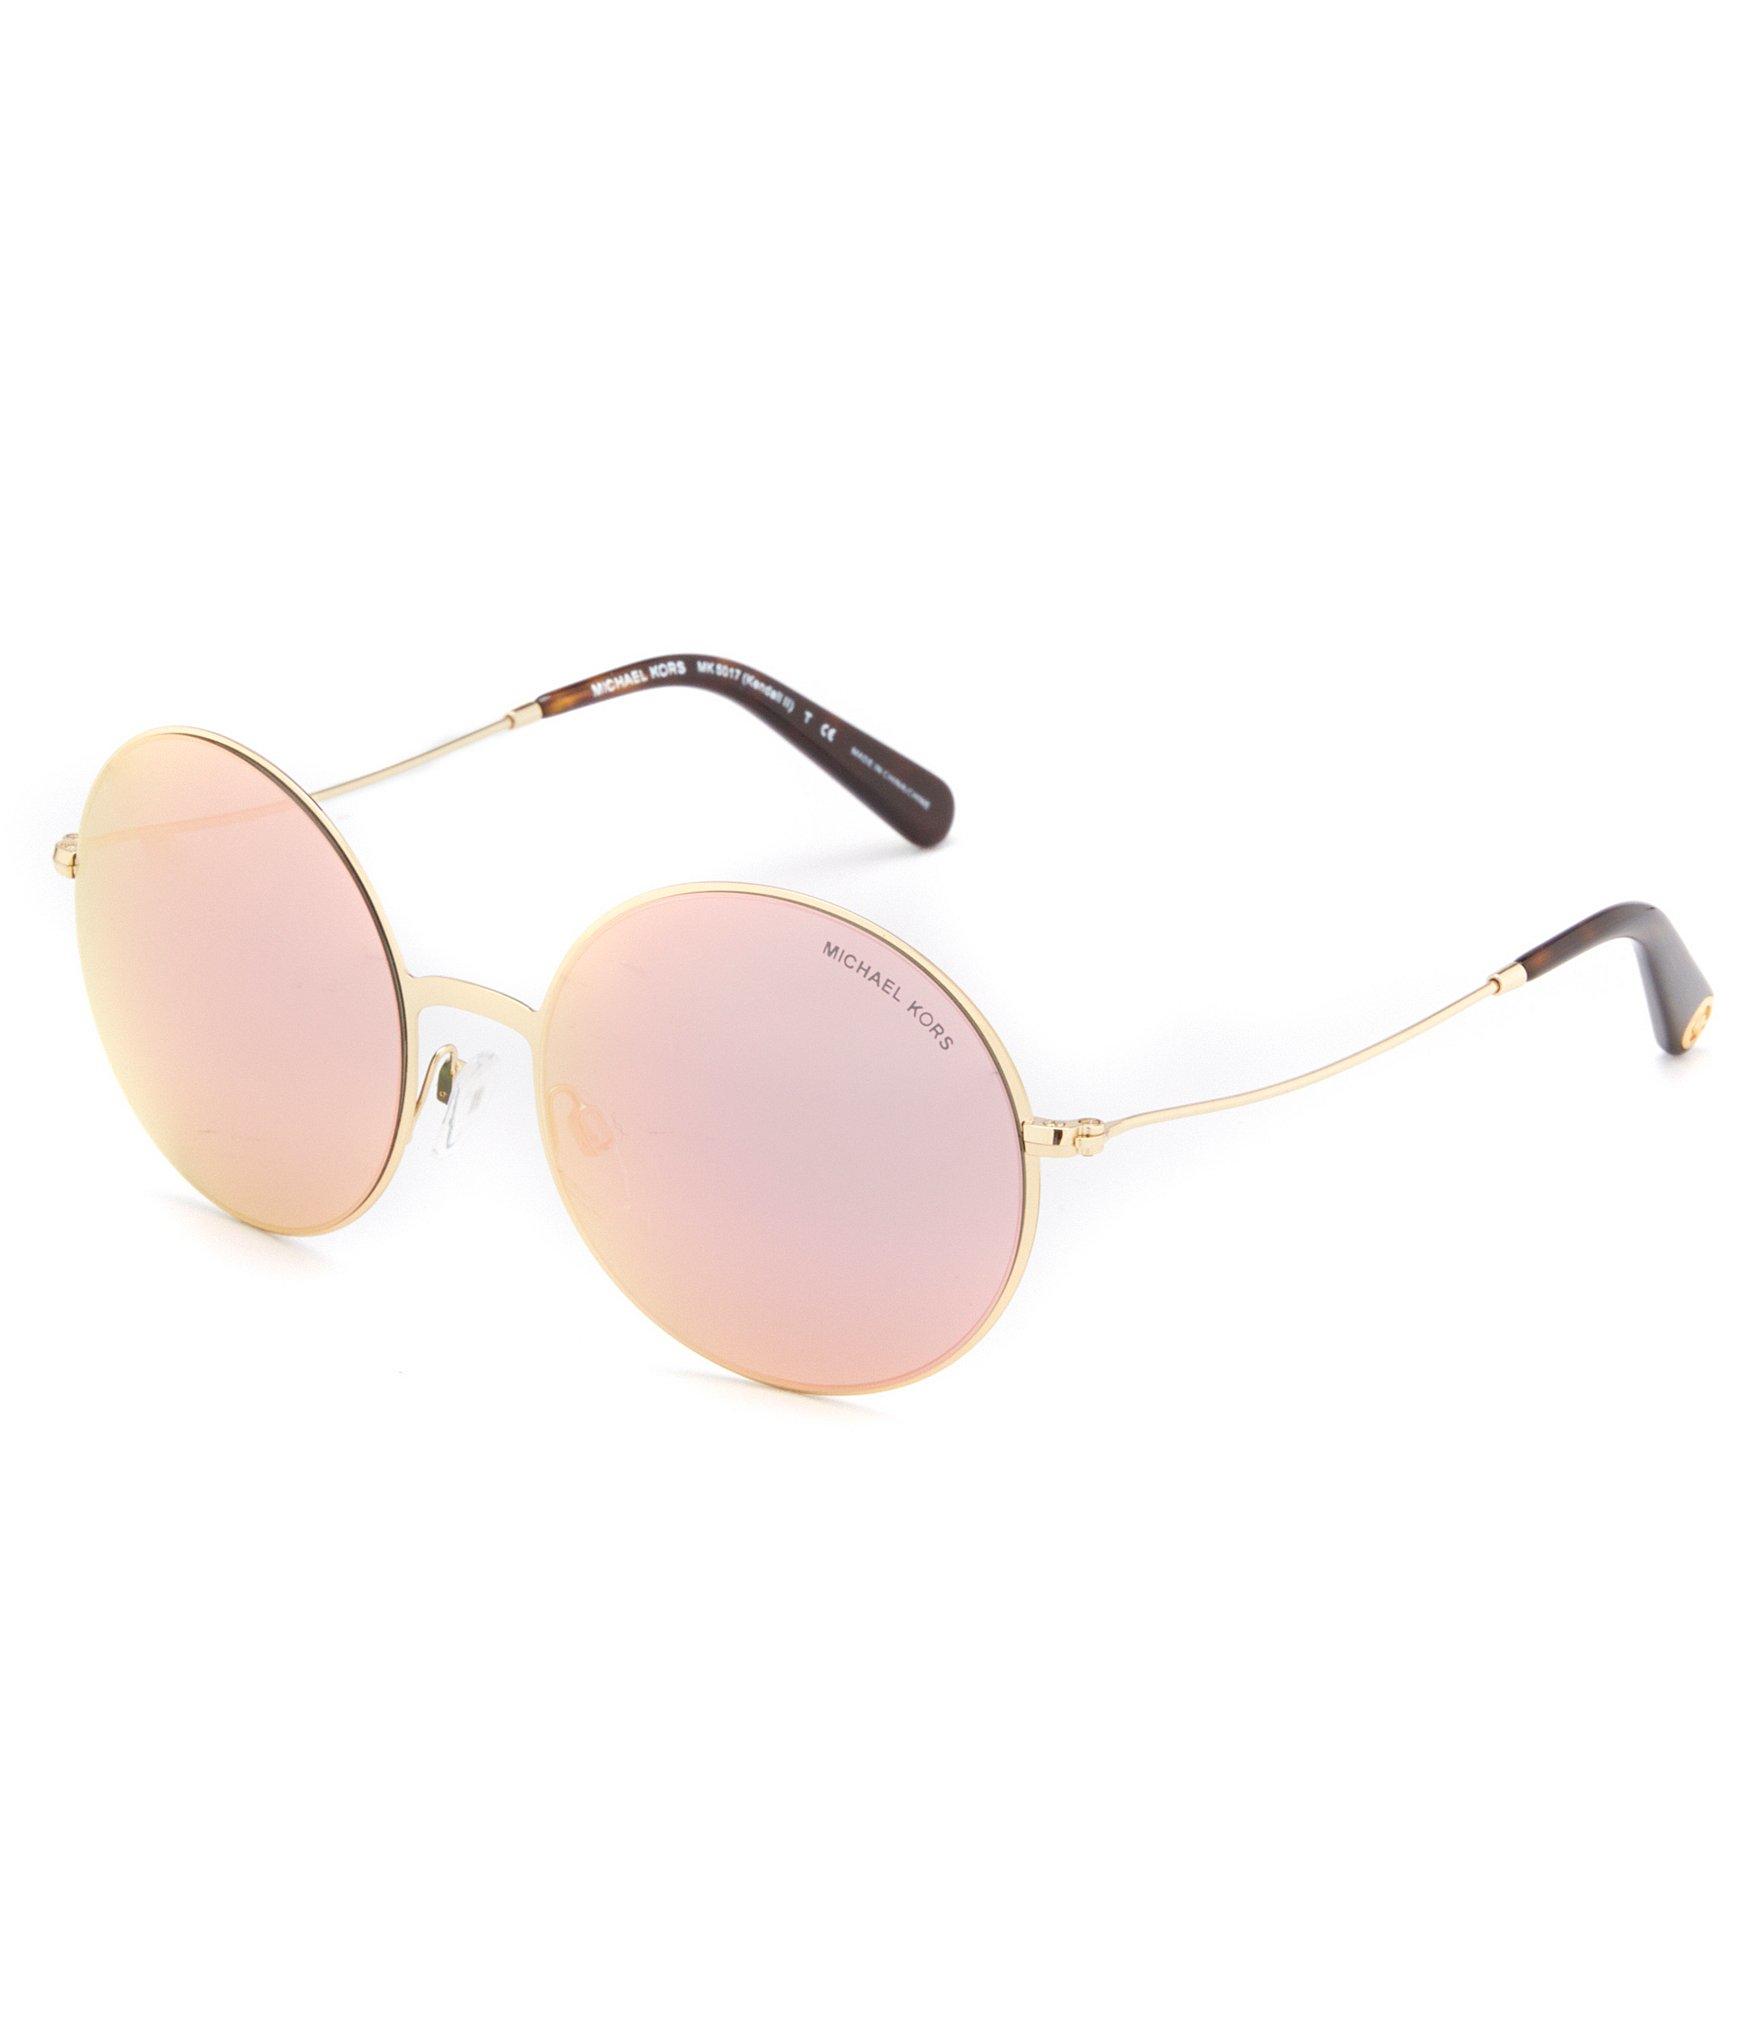 cb71633615e3 Michael Kors Kendall Round Rimless Mirror Lens Sunglasses in ...